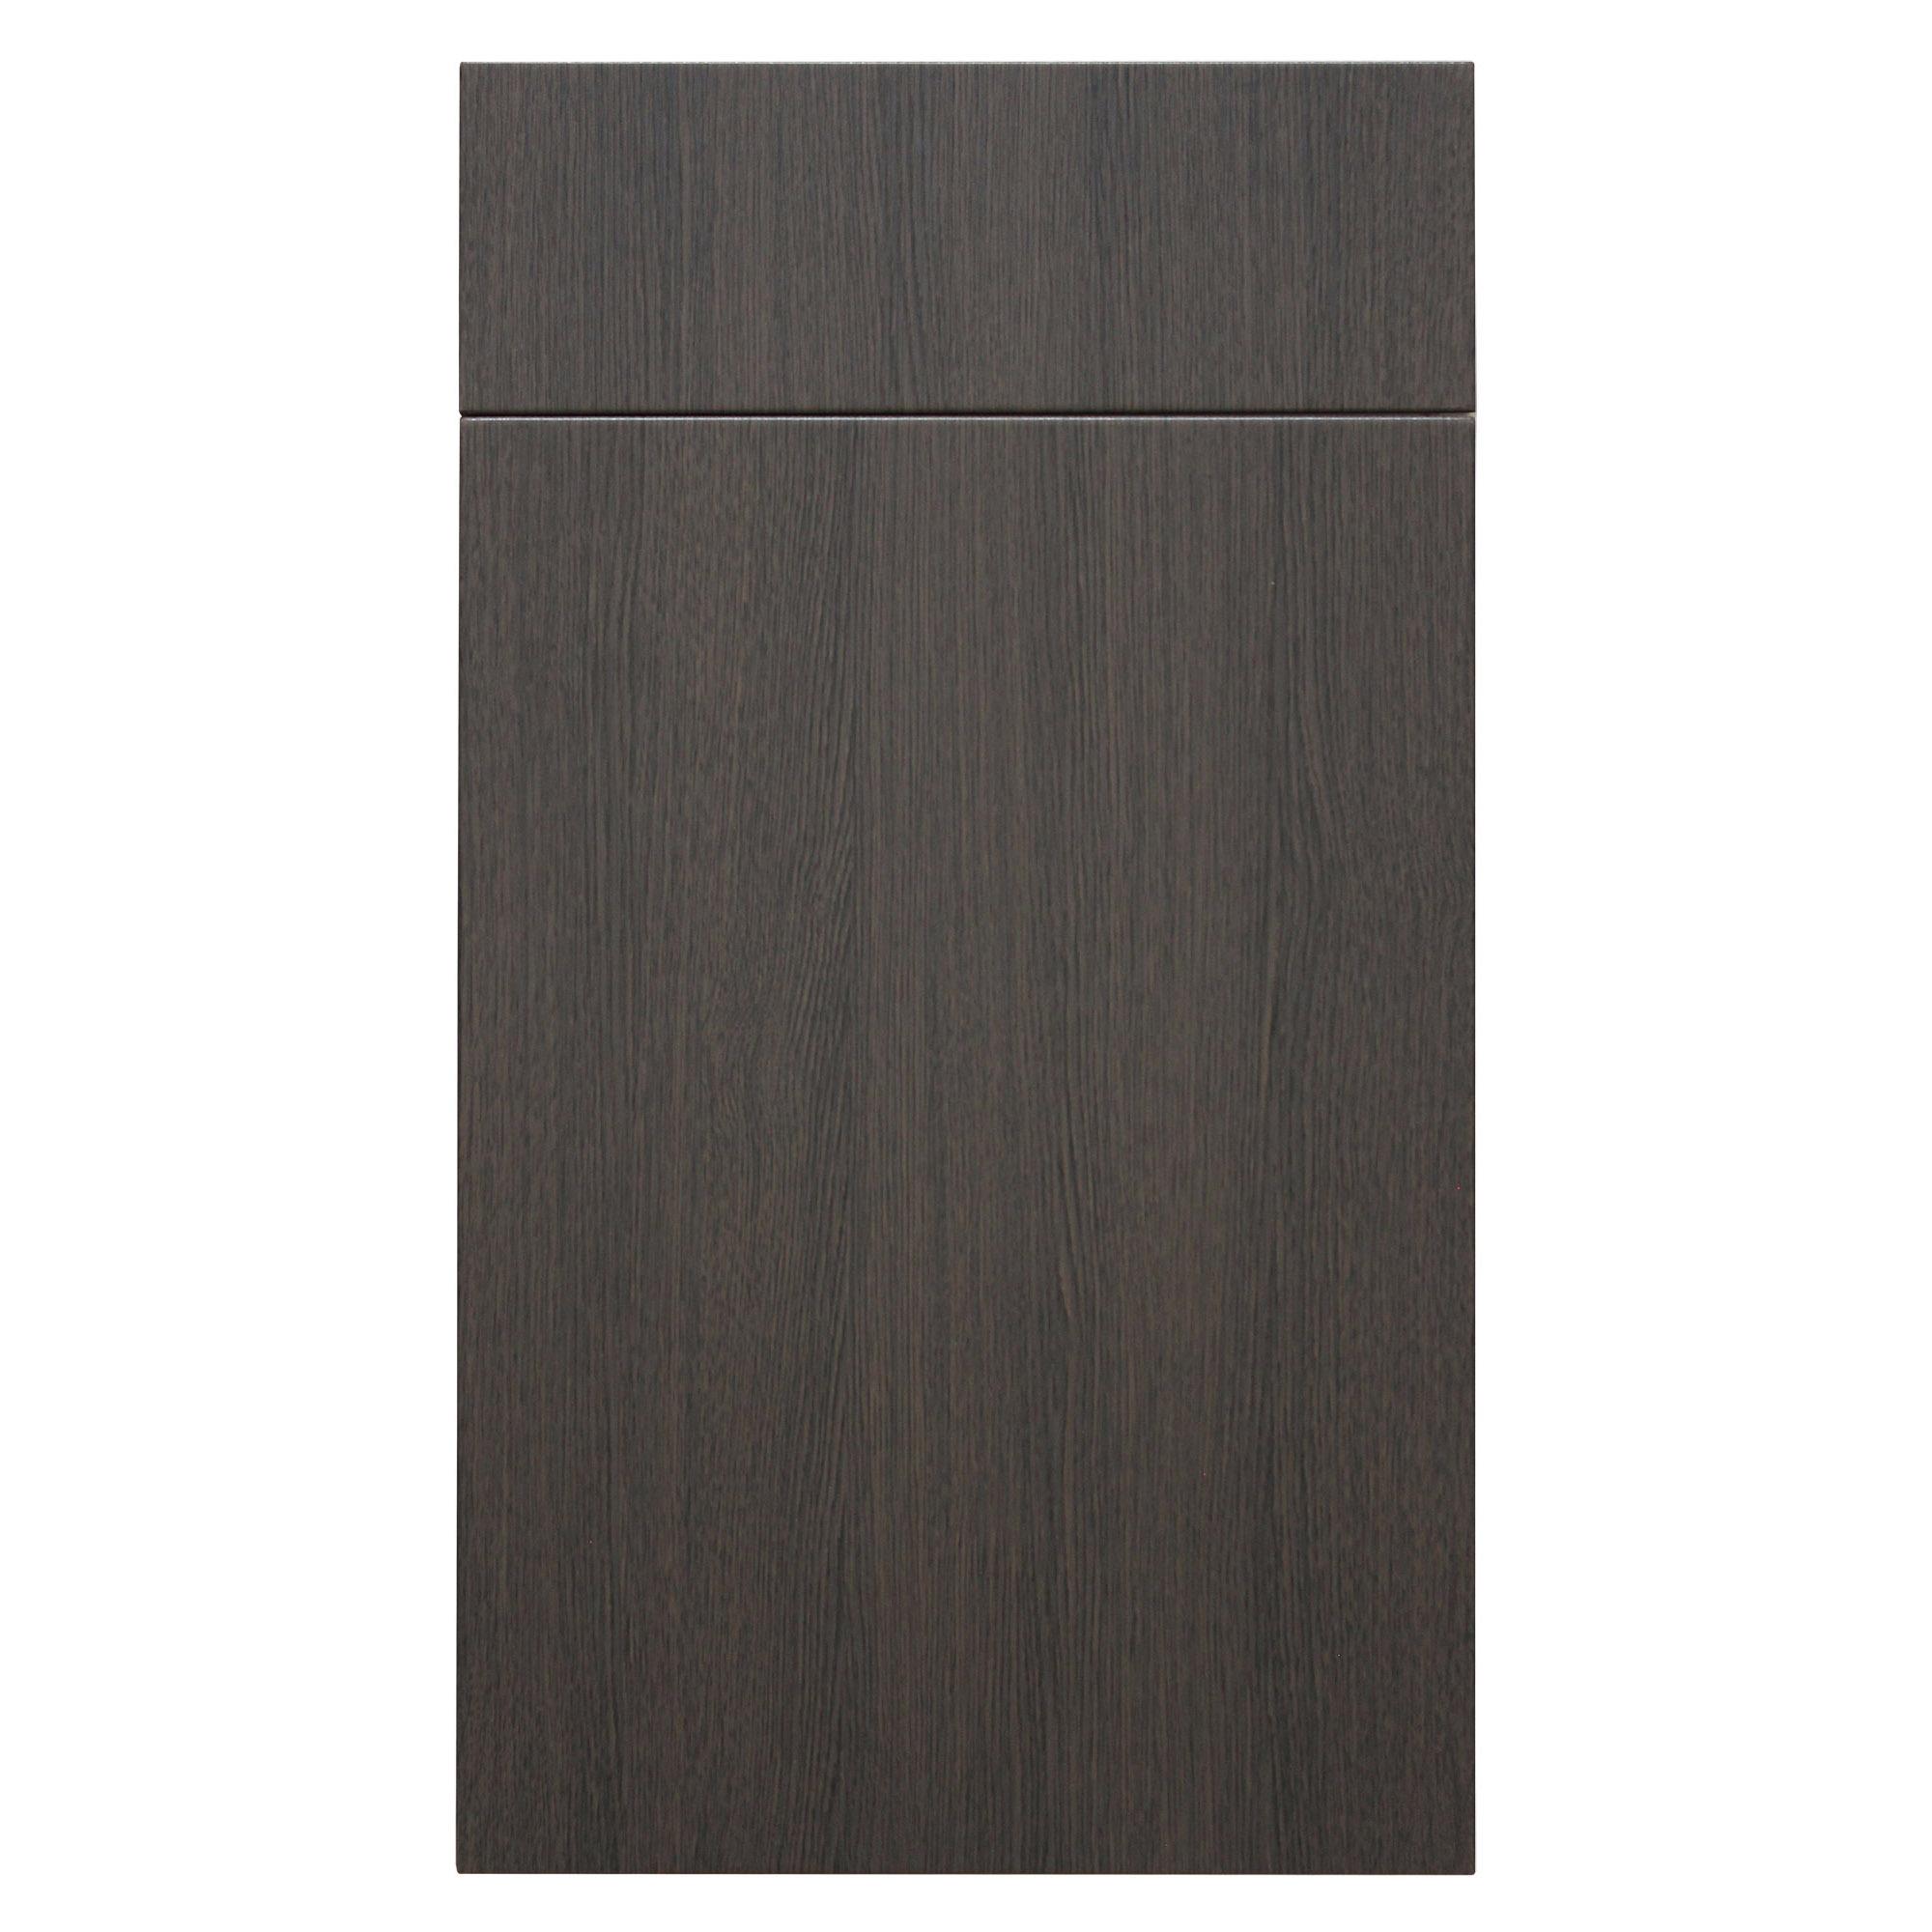 Oak Melinga Grey